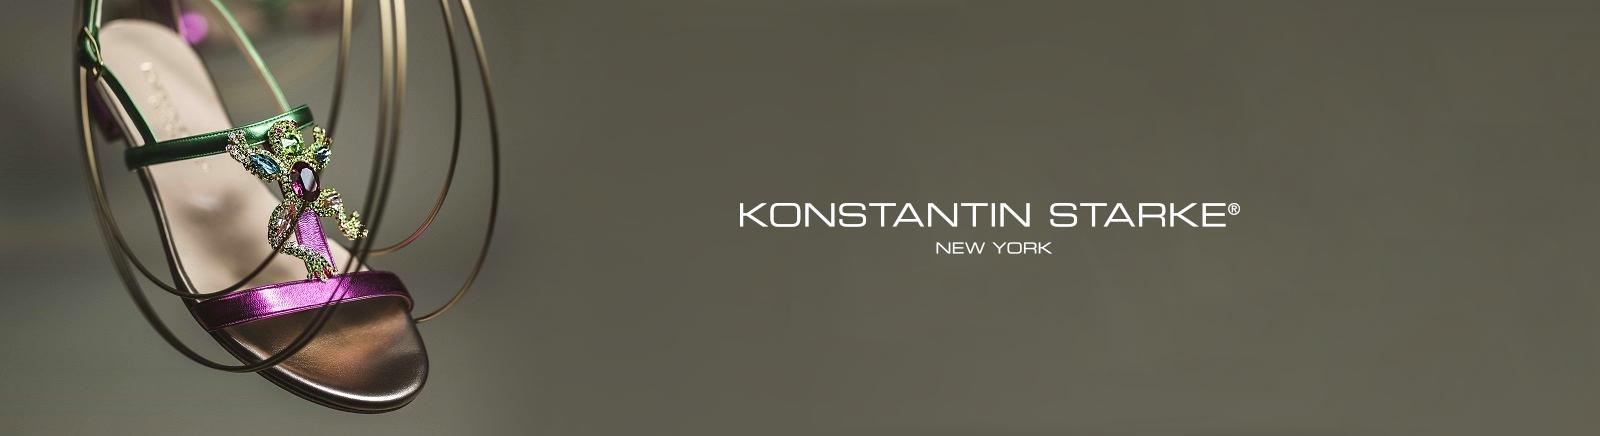 Juppen: Konstantin Starke Kinderschuhe online shoppen